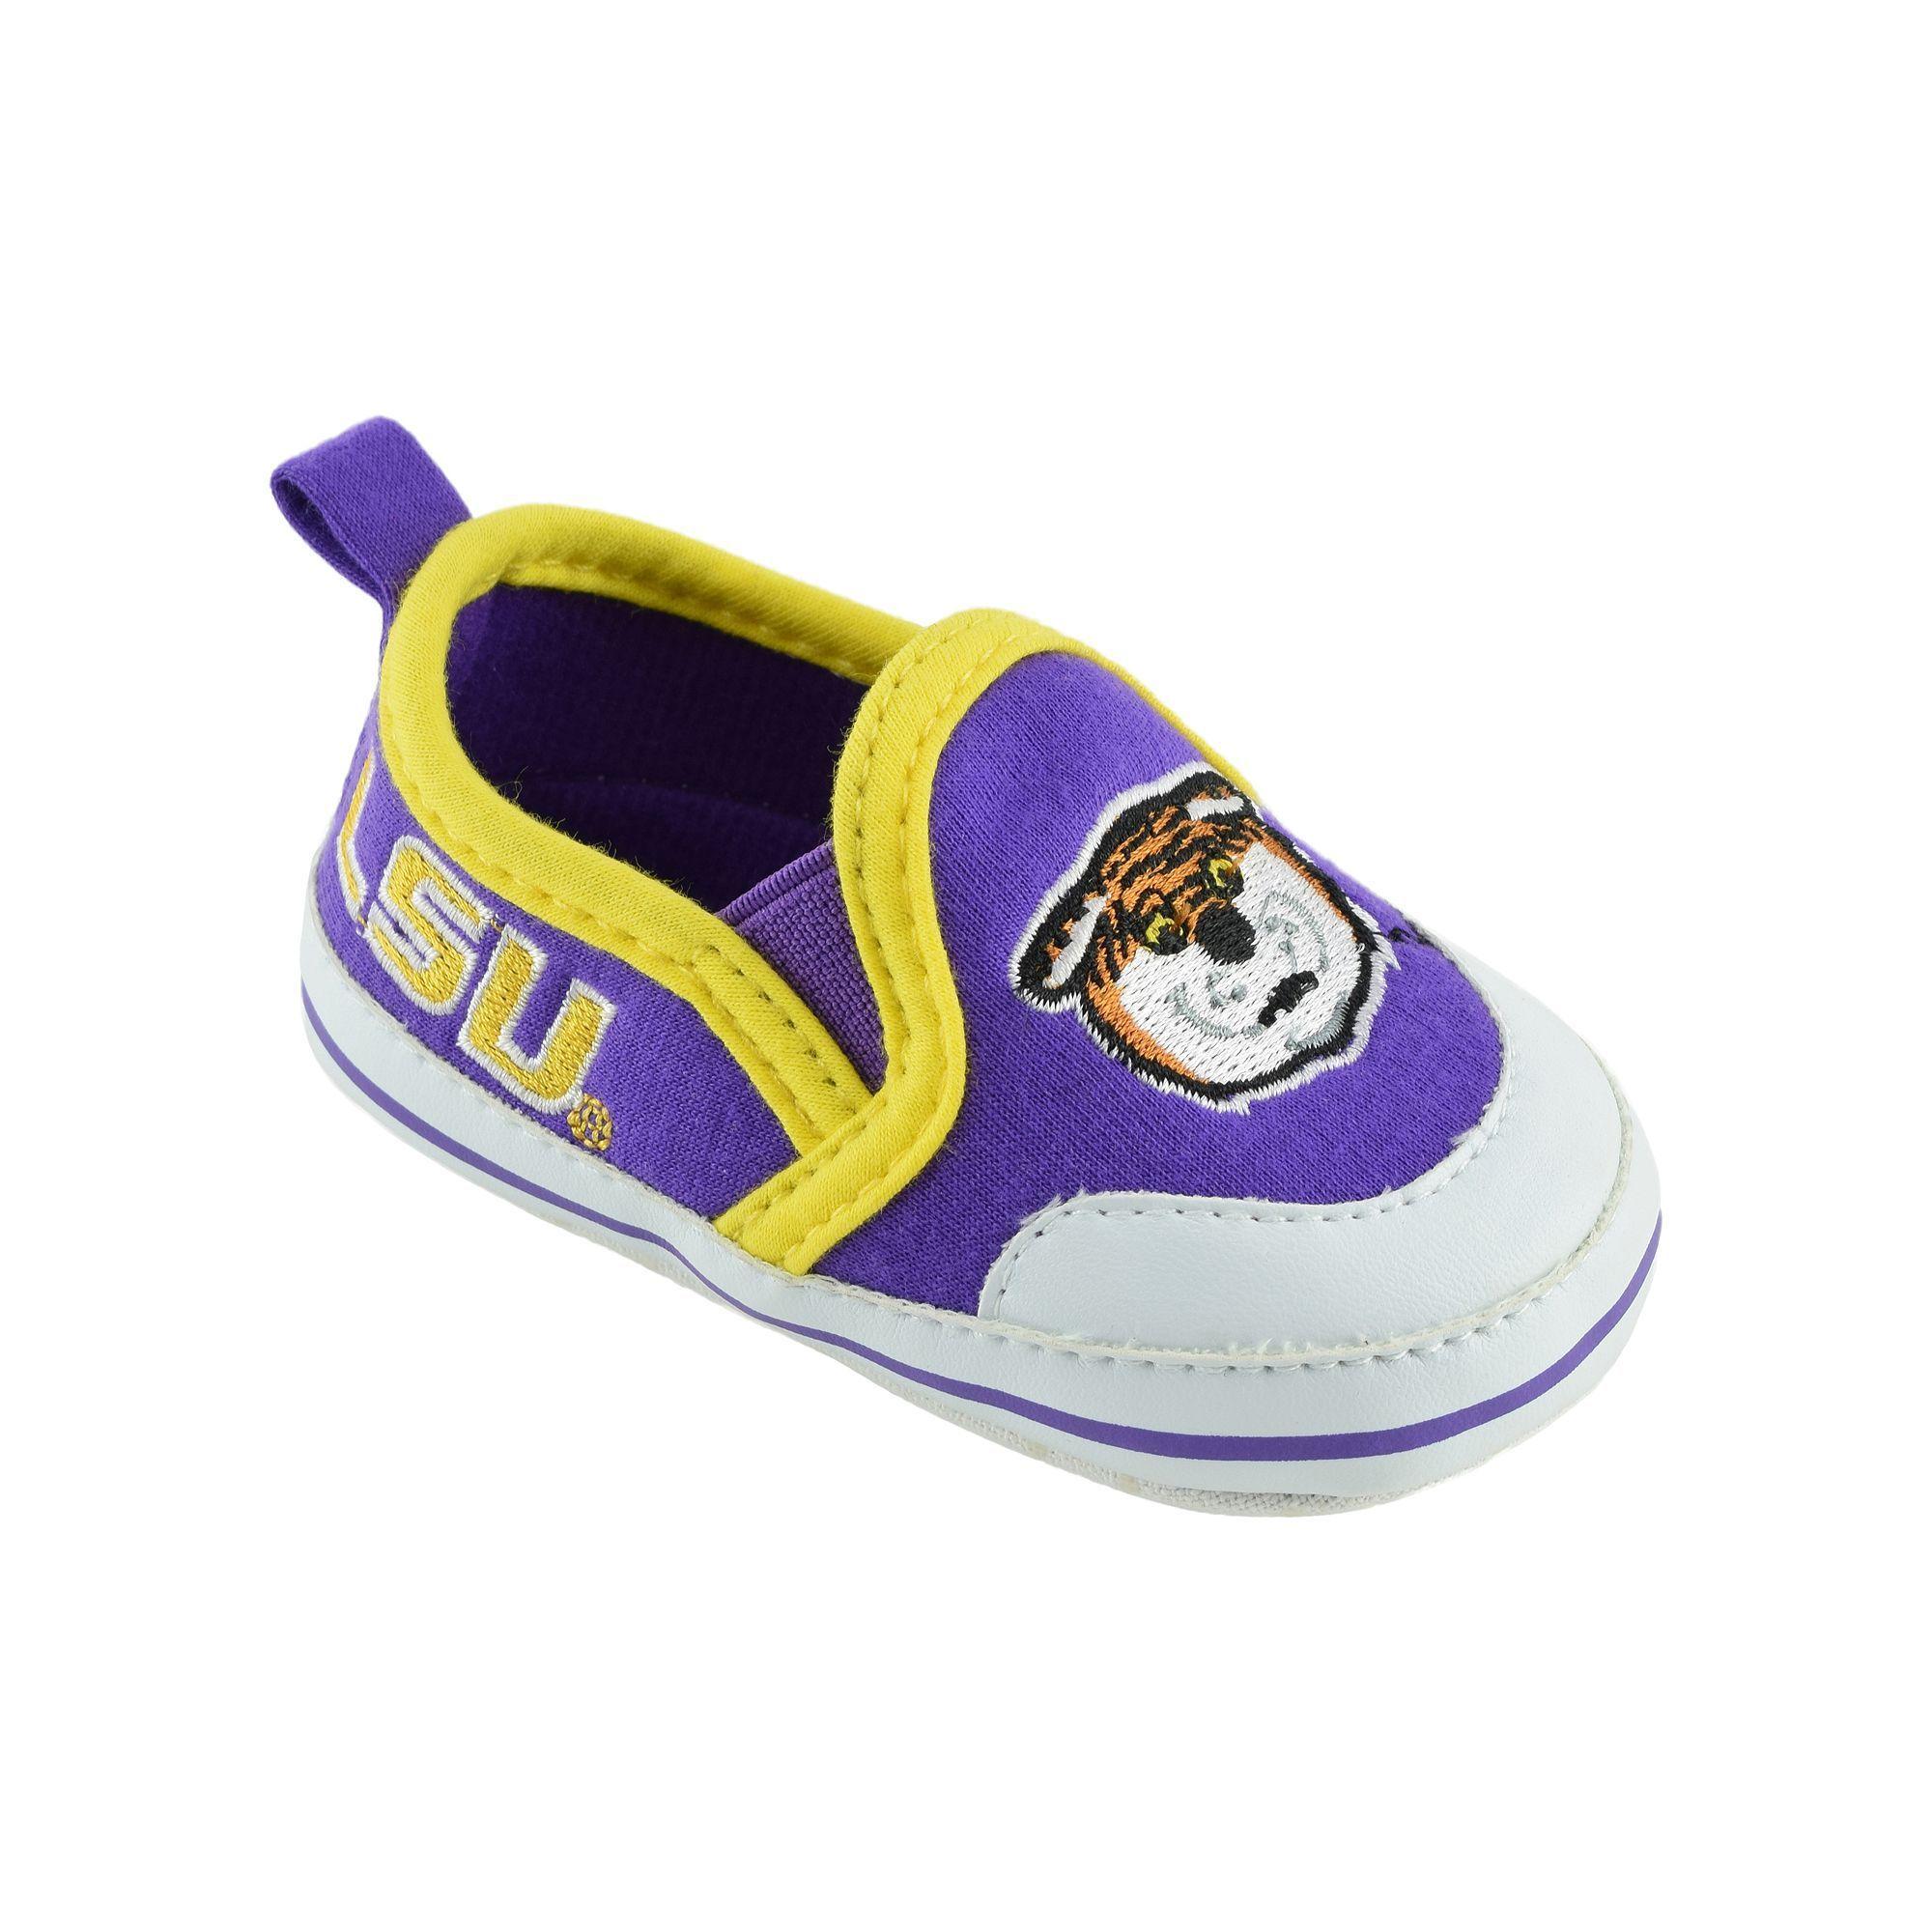 Err 512 Baby LSU Tigers Crib Shoes